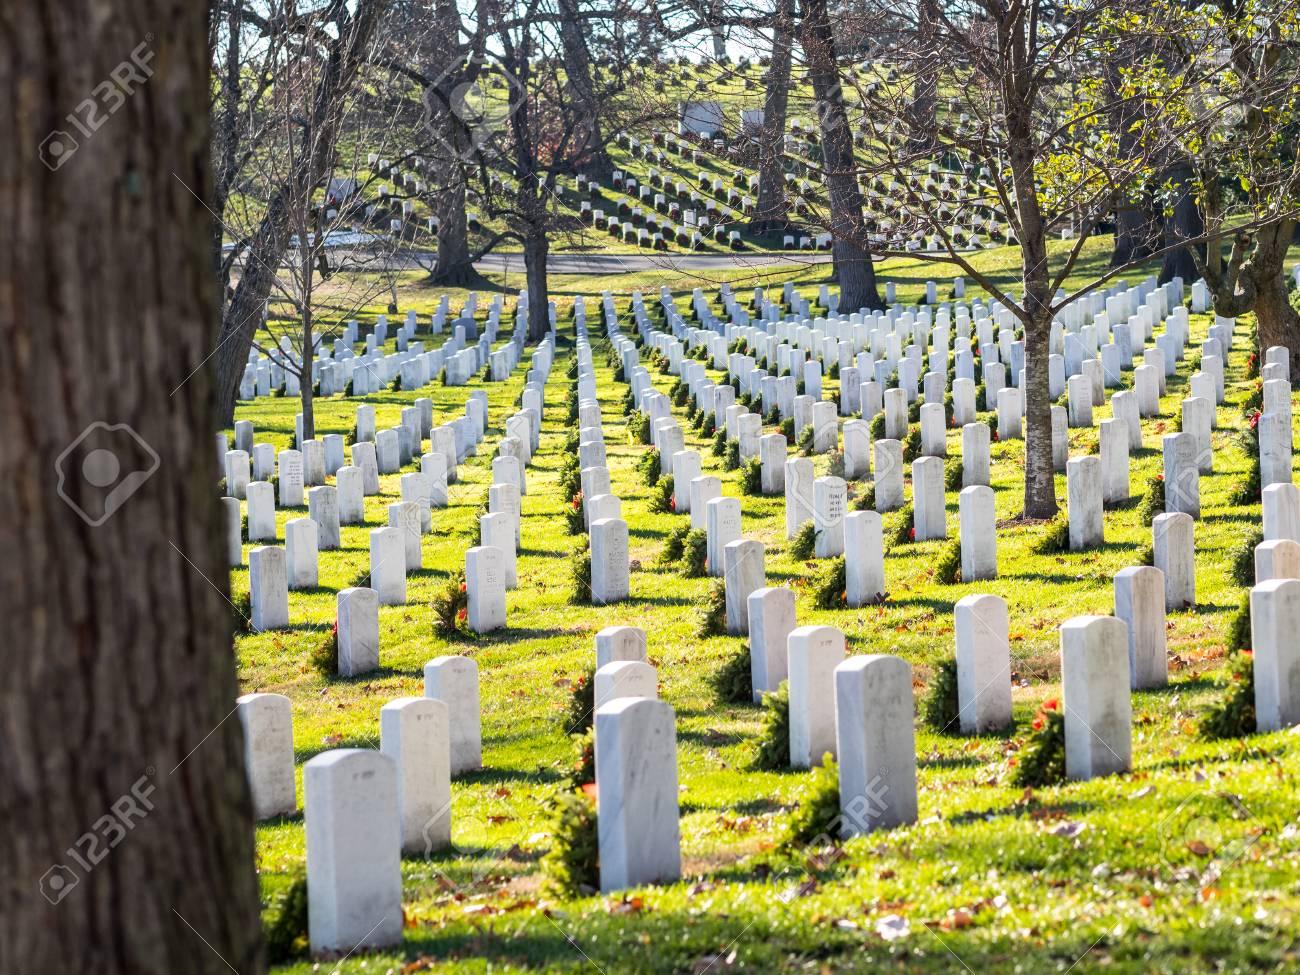 Christmas Time In Washington Dc.Washington Dc Usa December 26 2015 Gravestones On Arlington